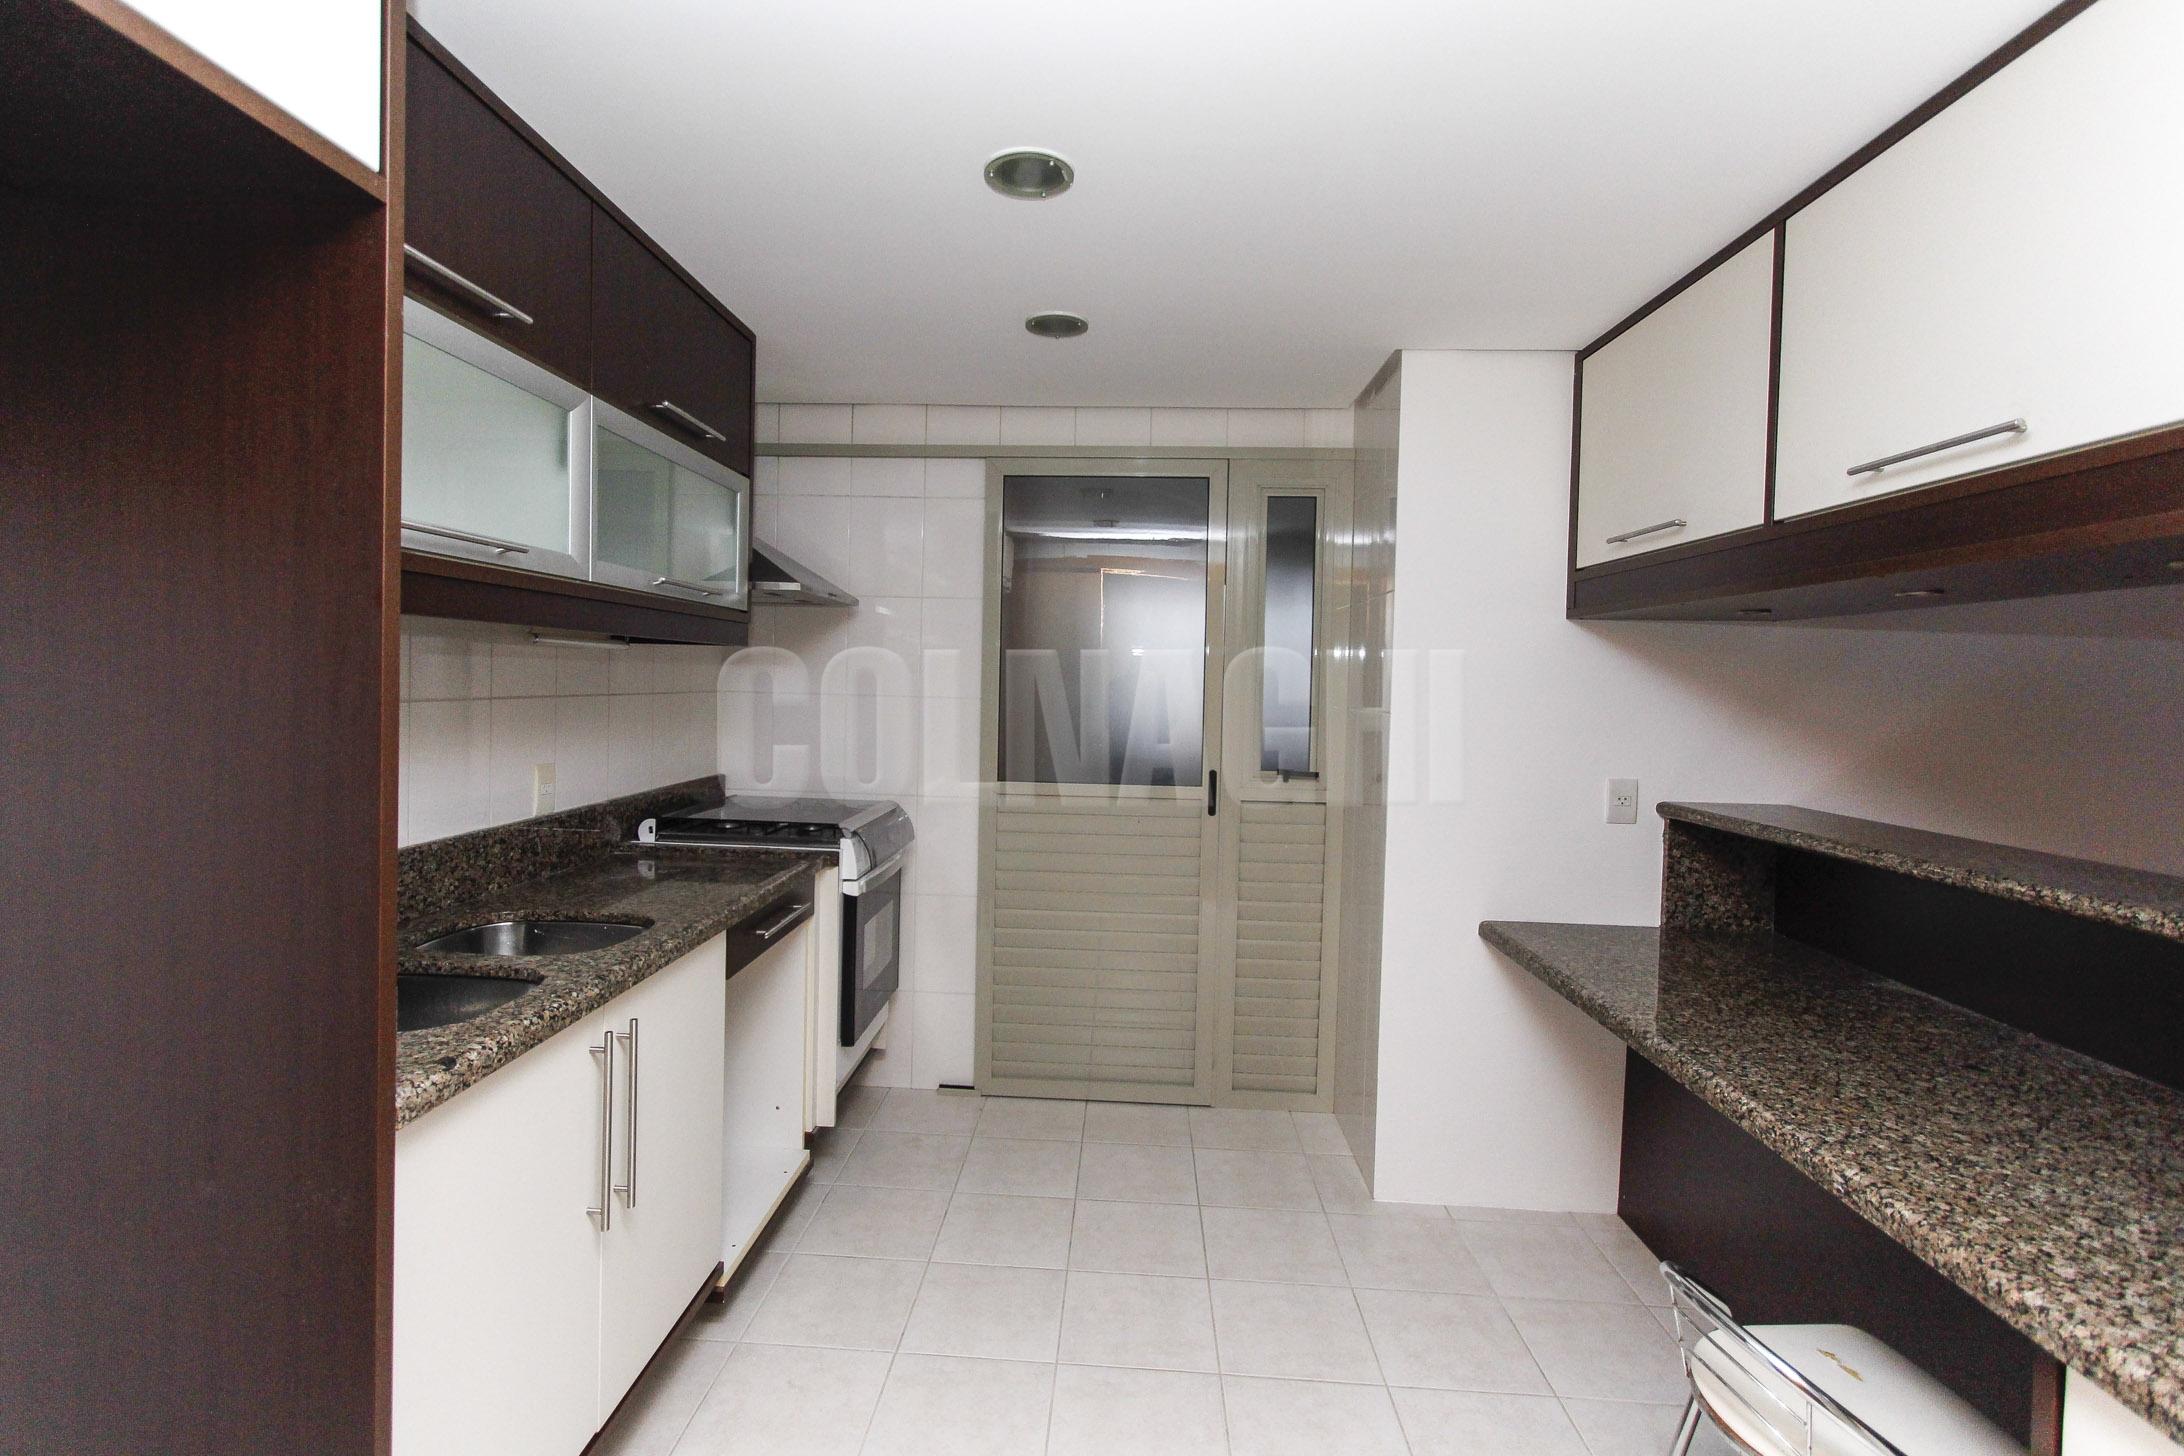 Dom Germano - Apto 3 Dorm, Auxiliadora, Porto Alegre (CL10693) - Foto 13